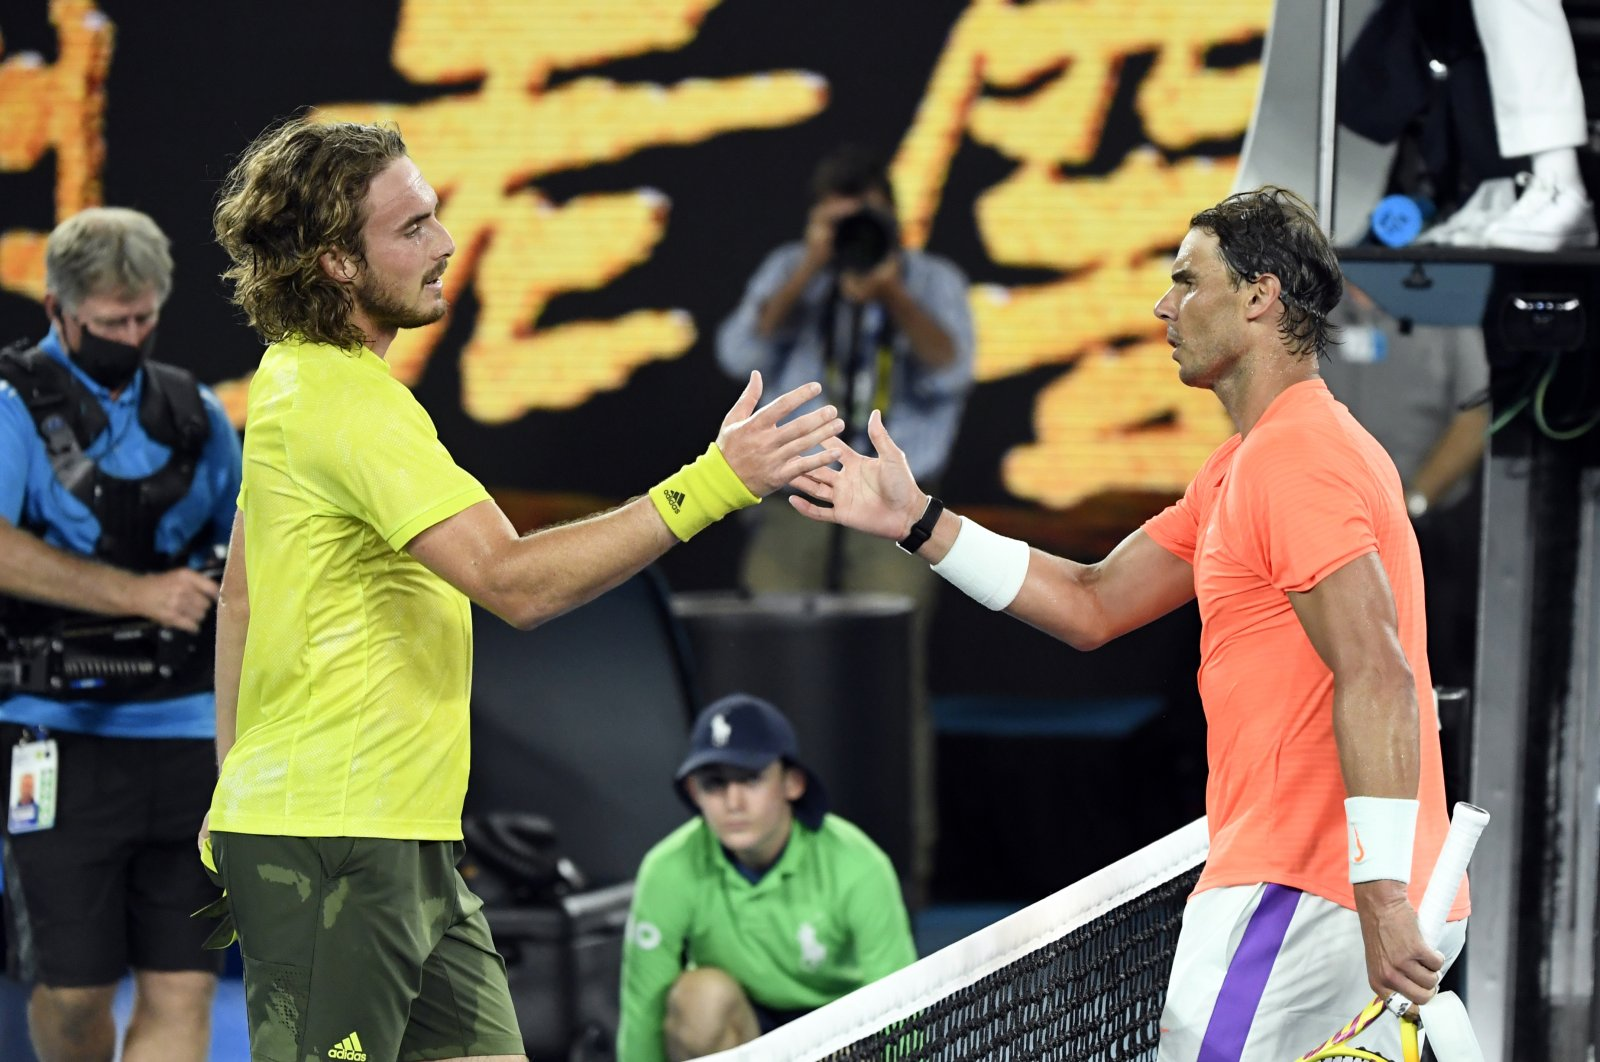 Greece's Stefanos Tsitsipas (L) shakes hands with Spain's Rafael Nadal after winning his Australian Open quarterfinal match, Melbourne, Australia, Feb. 17, 2021. (Reuters Photo)